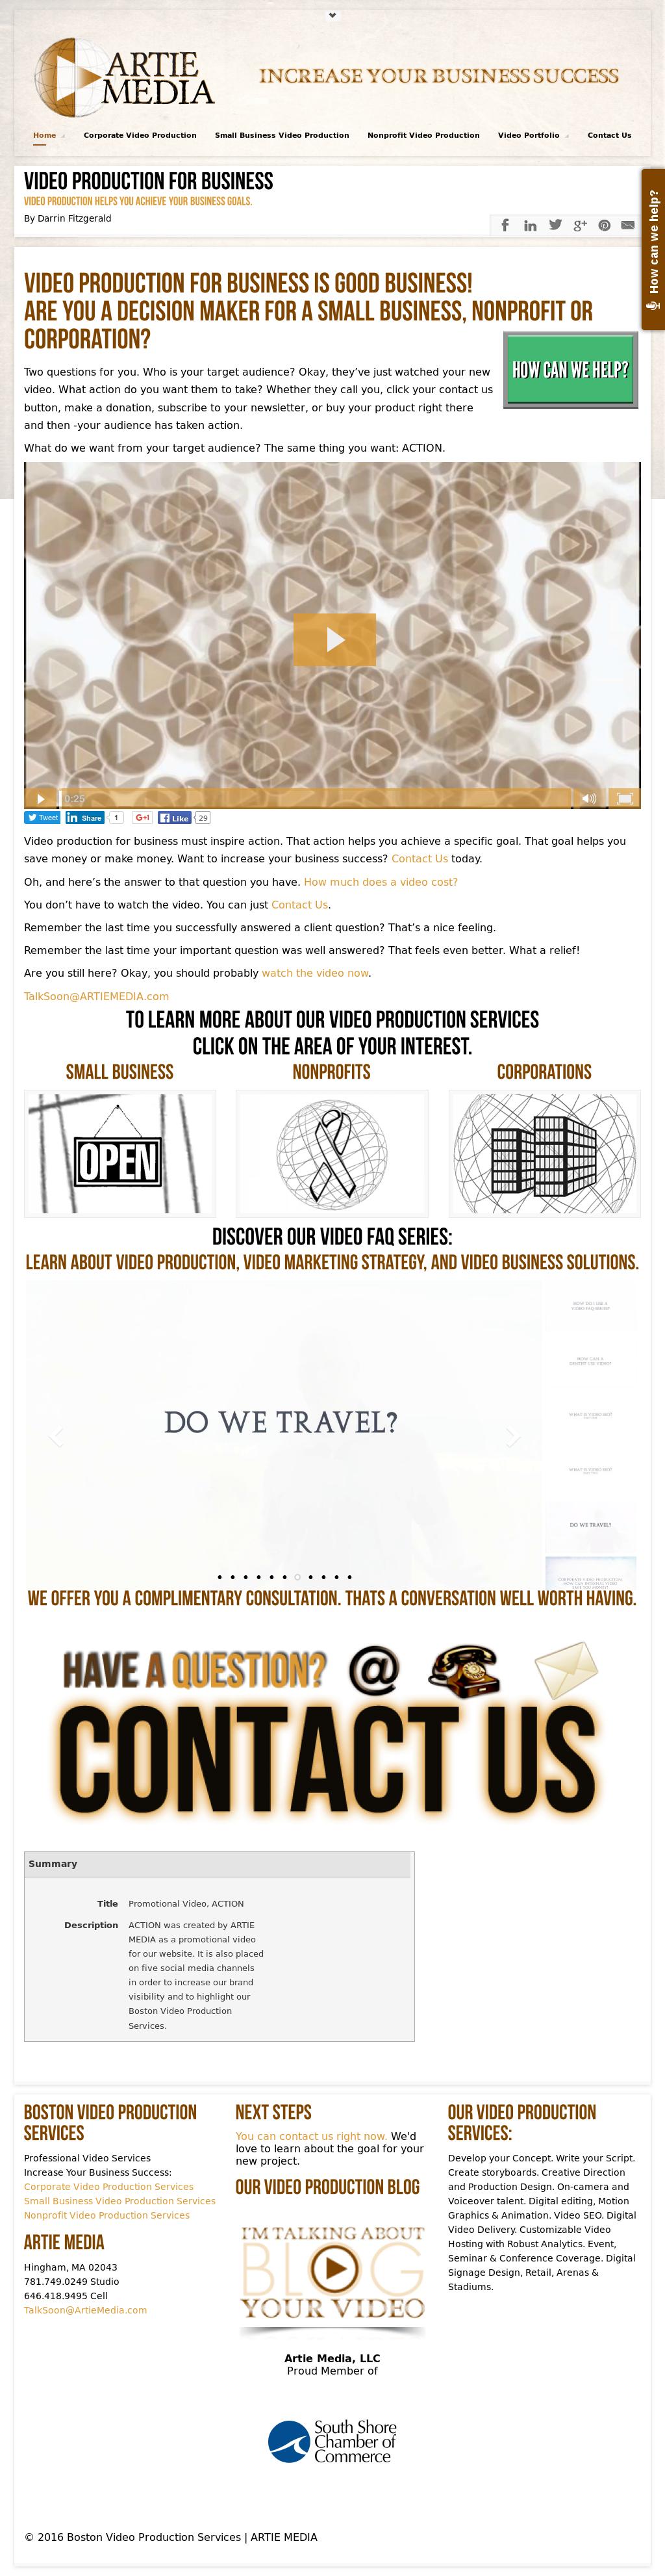 Artiemedia Competitors, Revenue and Employees - Owler